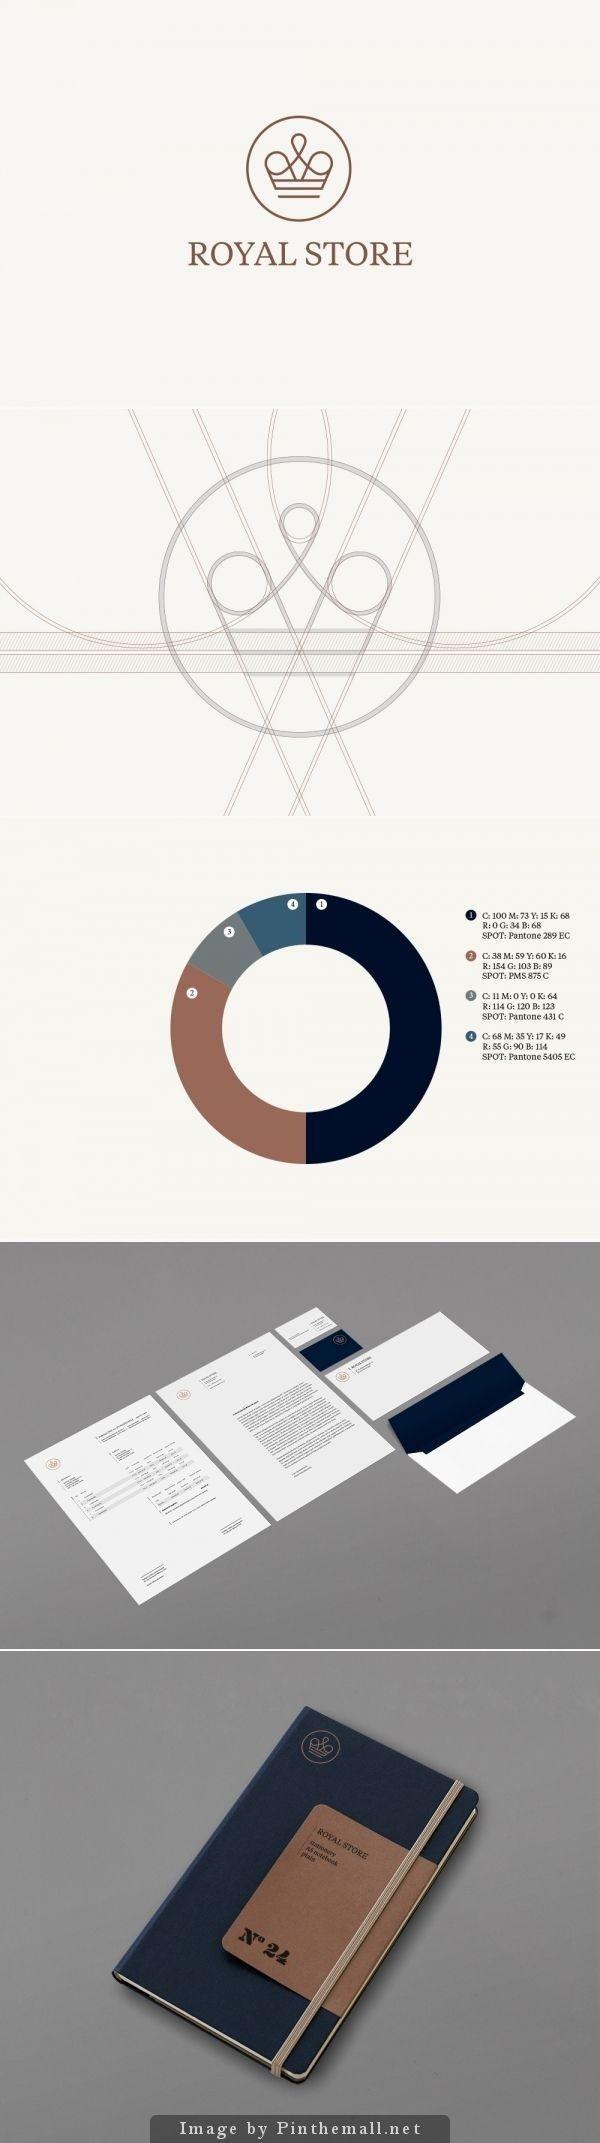 Designspiration — Design Inspiration | Logo | Pinterest ...